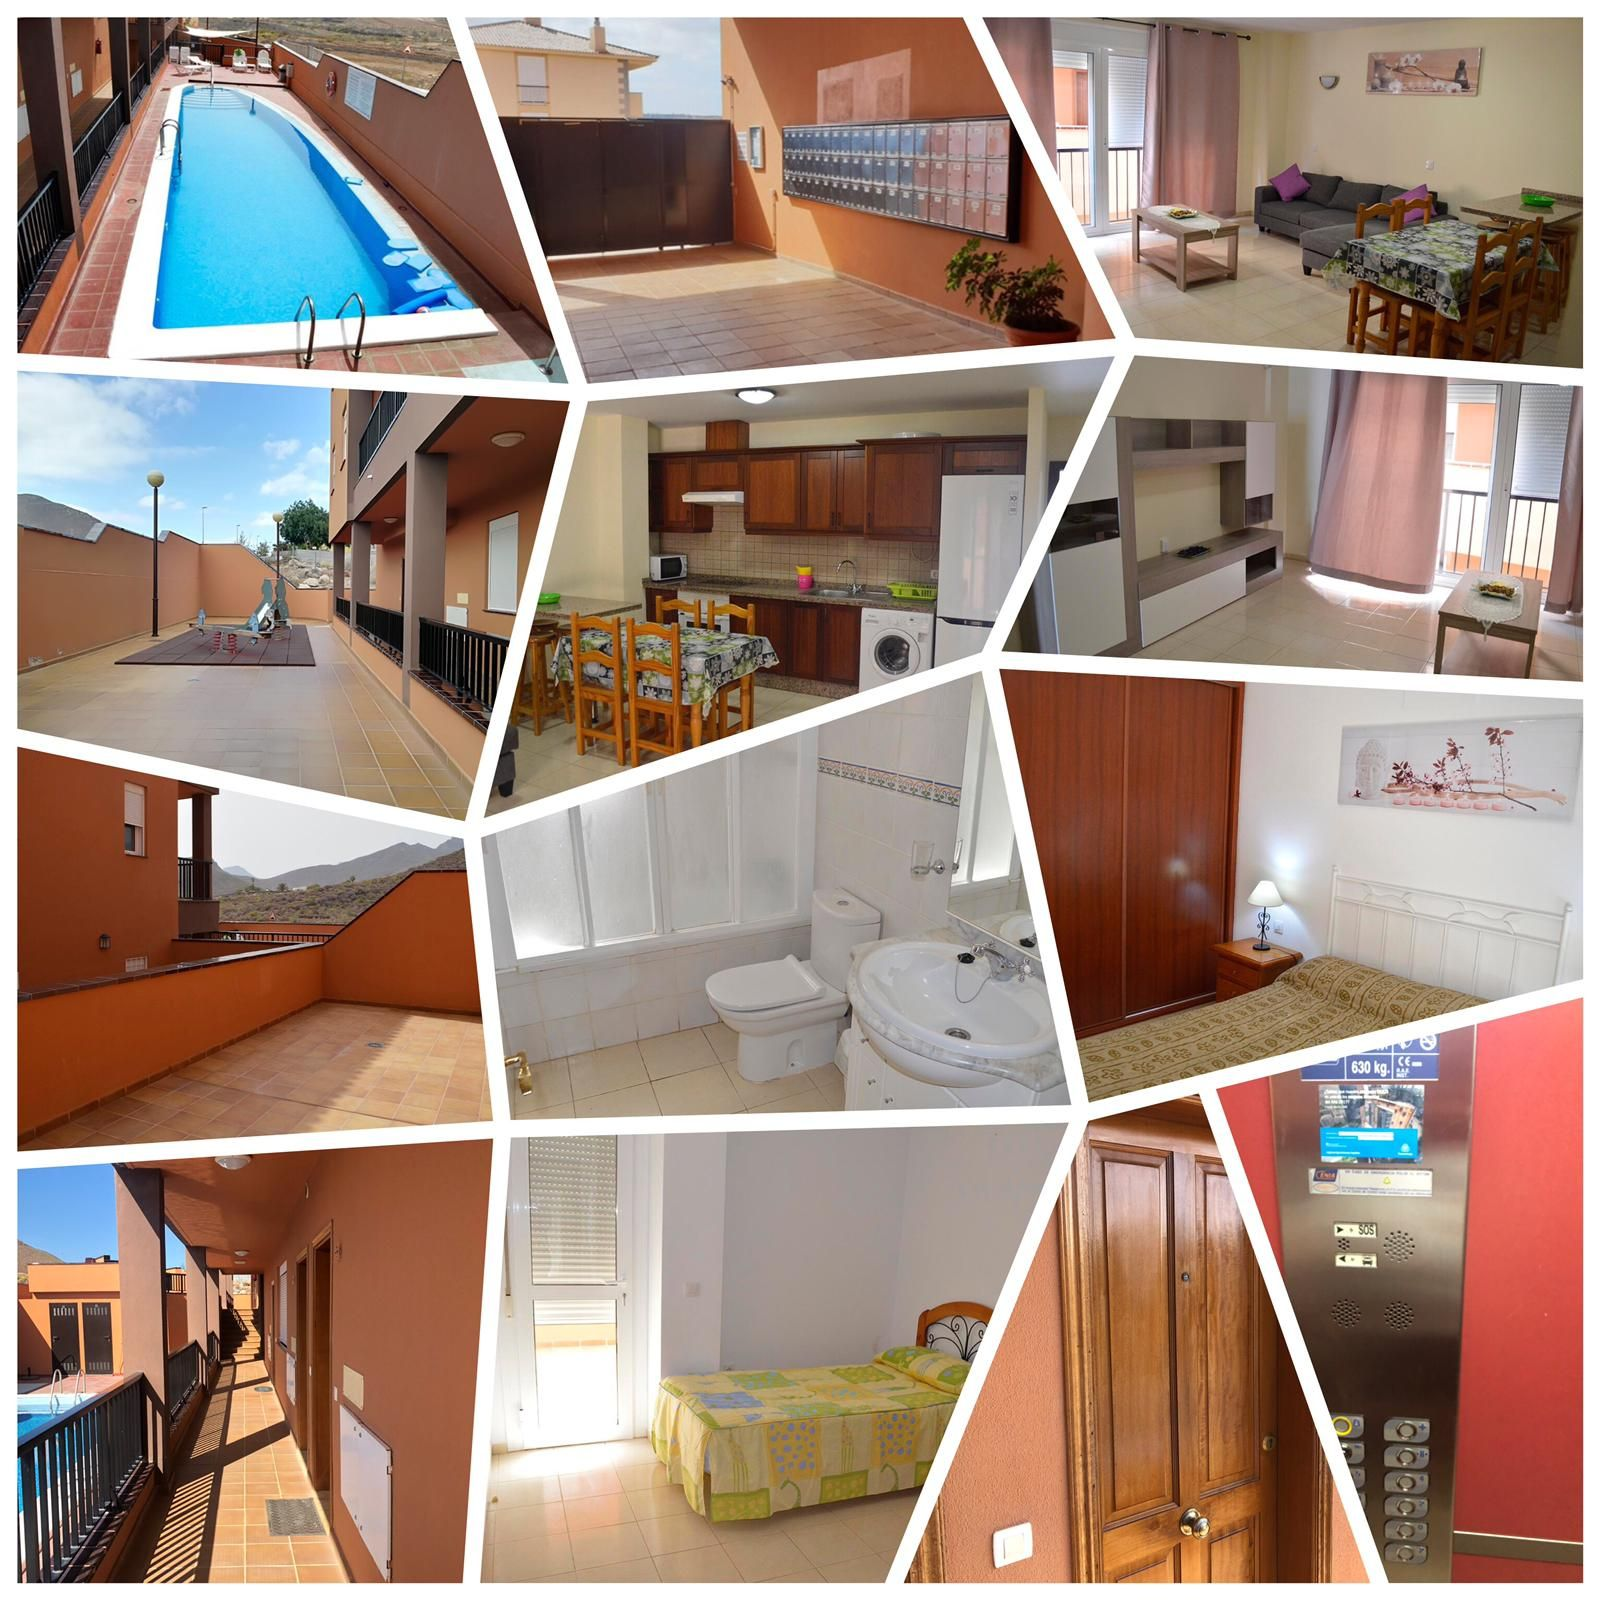 Lägenhet i San Miguel de Abona, LLANO DEL CAMELLO, uthyres